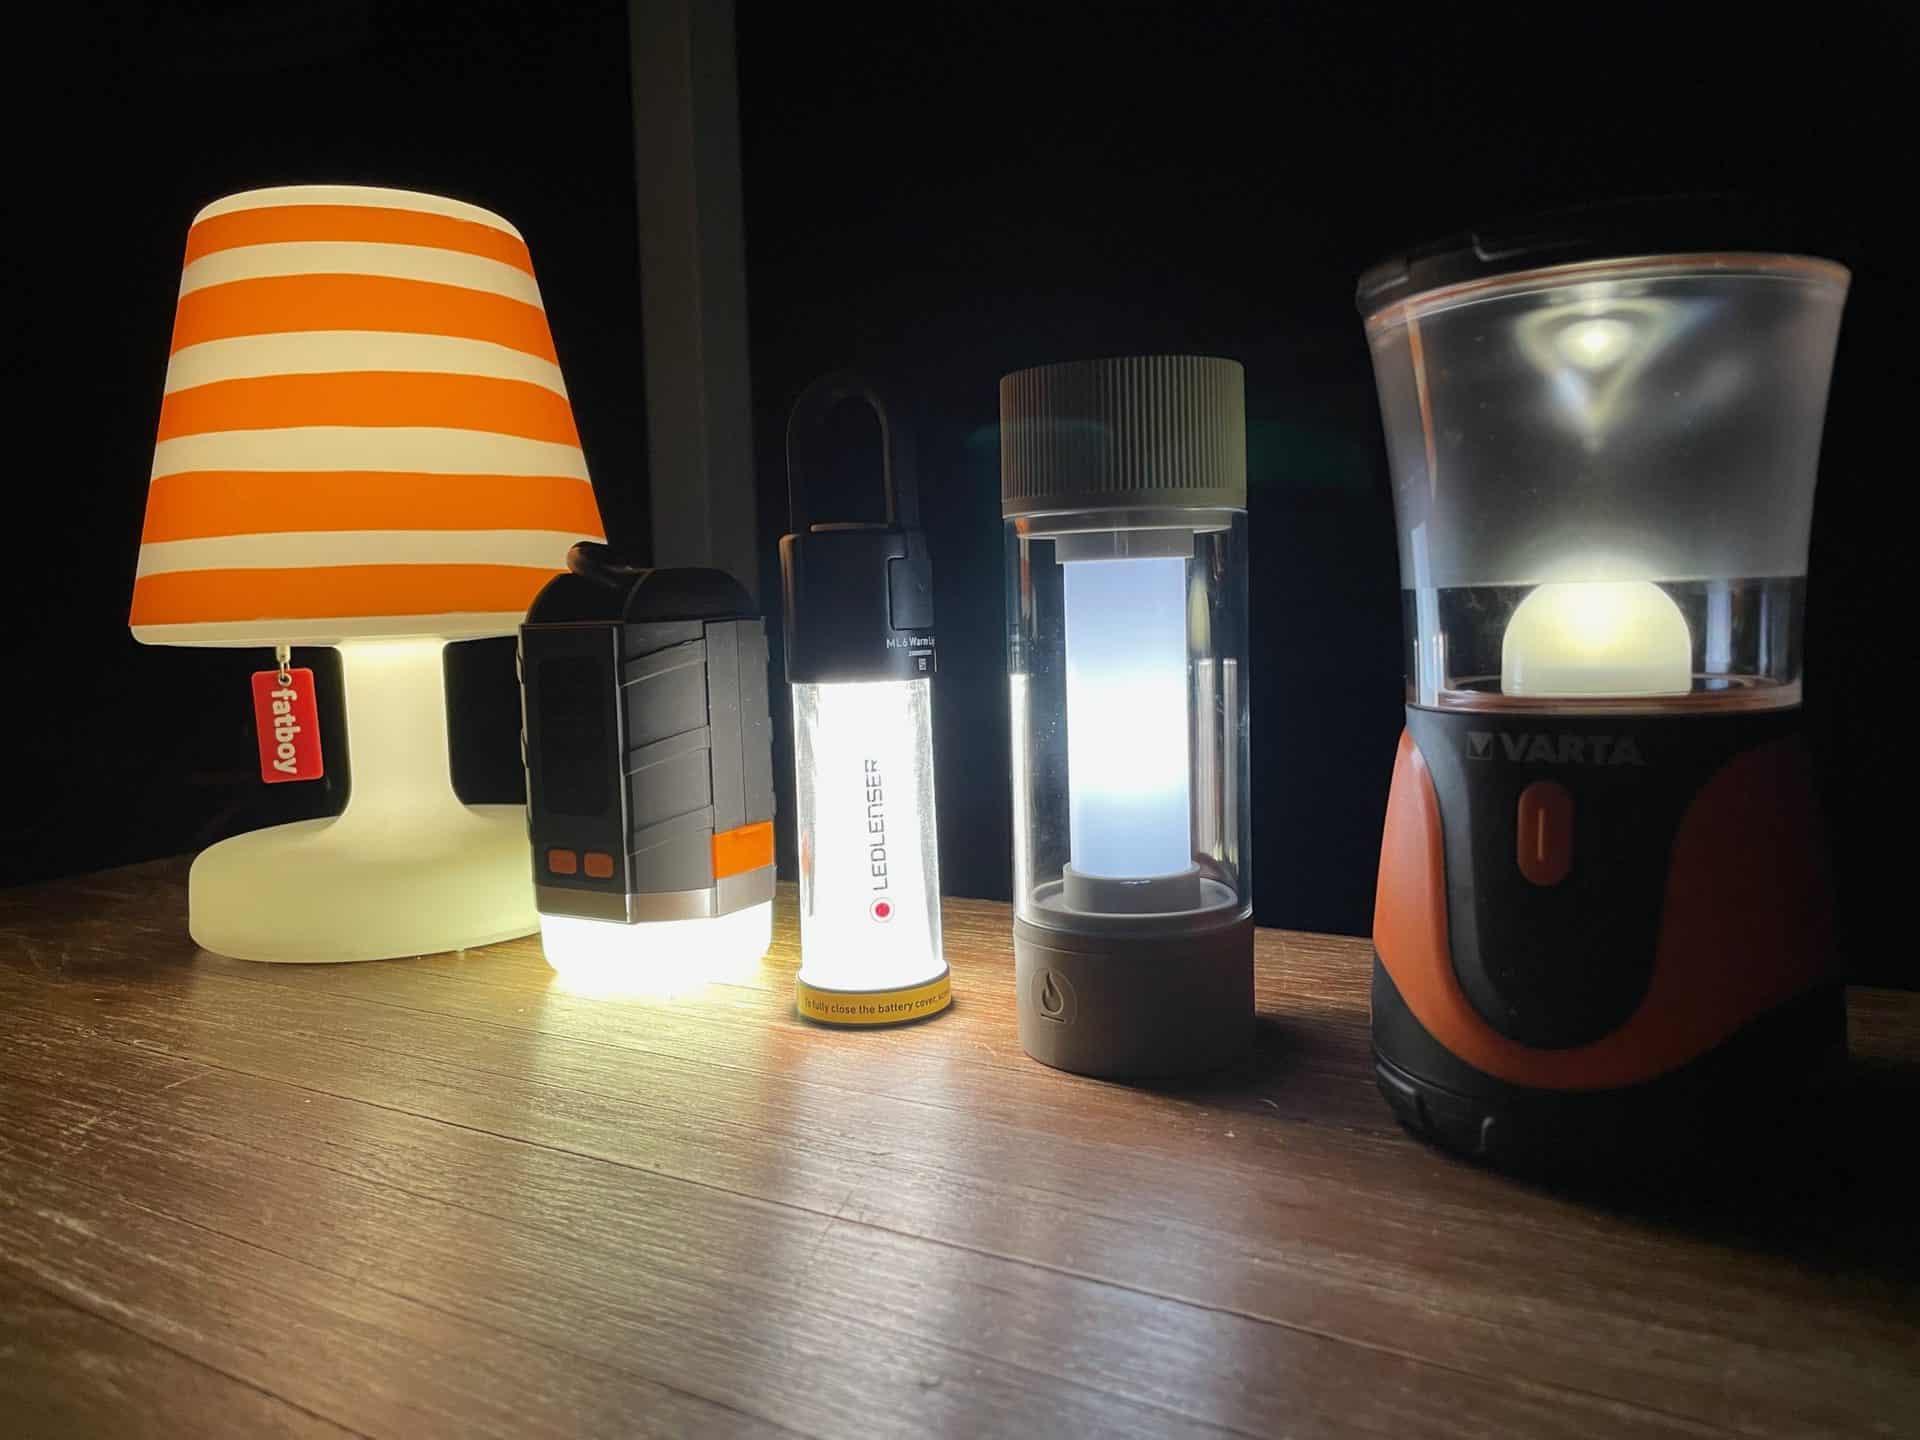 Camping-LED-Lampen-Fatboy-Edison-the-Petit-Lanktoo-Ledlenser-ML6-Fatboy-Tjoepke-Varta